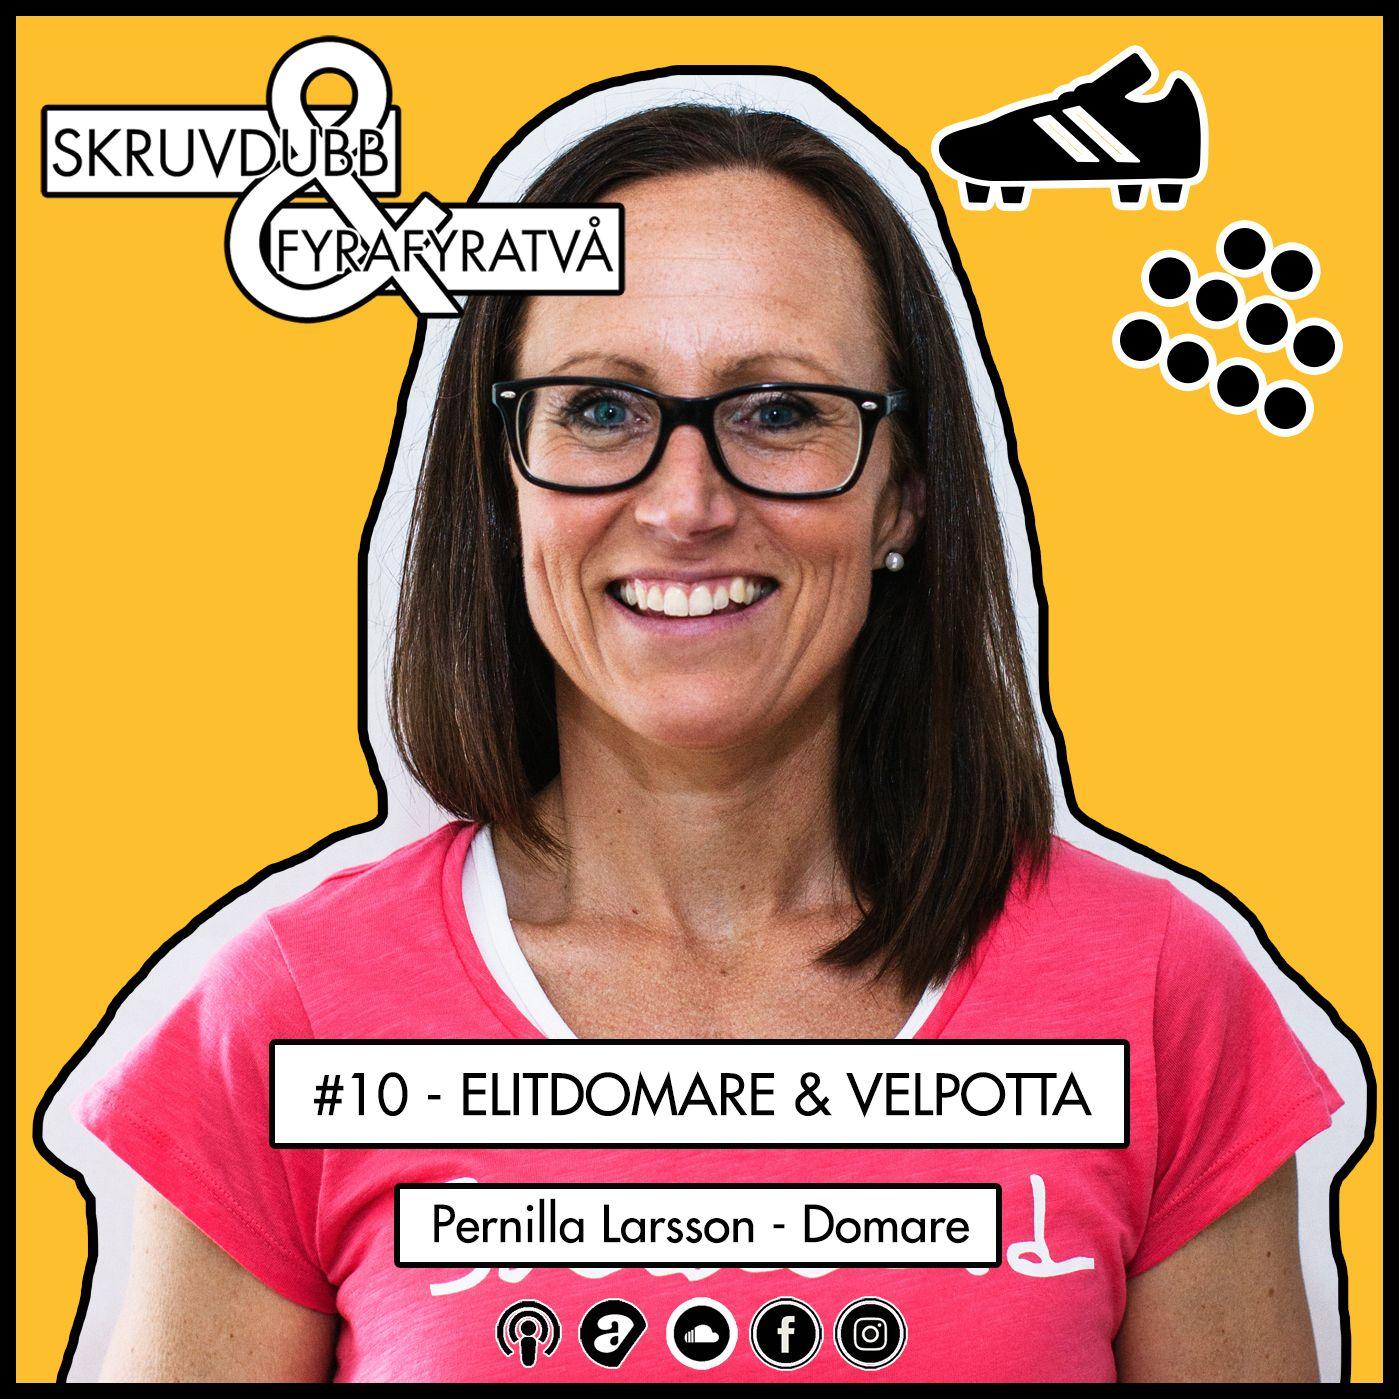 Elitdomare   Velpotta -  10 - Pernilla Larsson 2c302764ee150